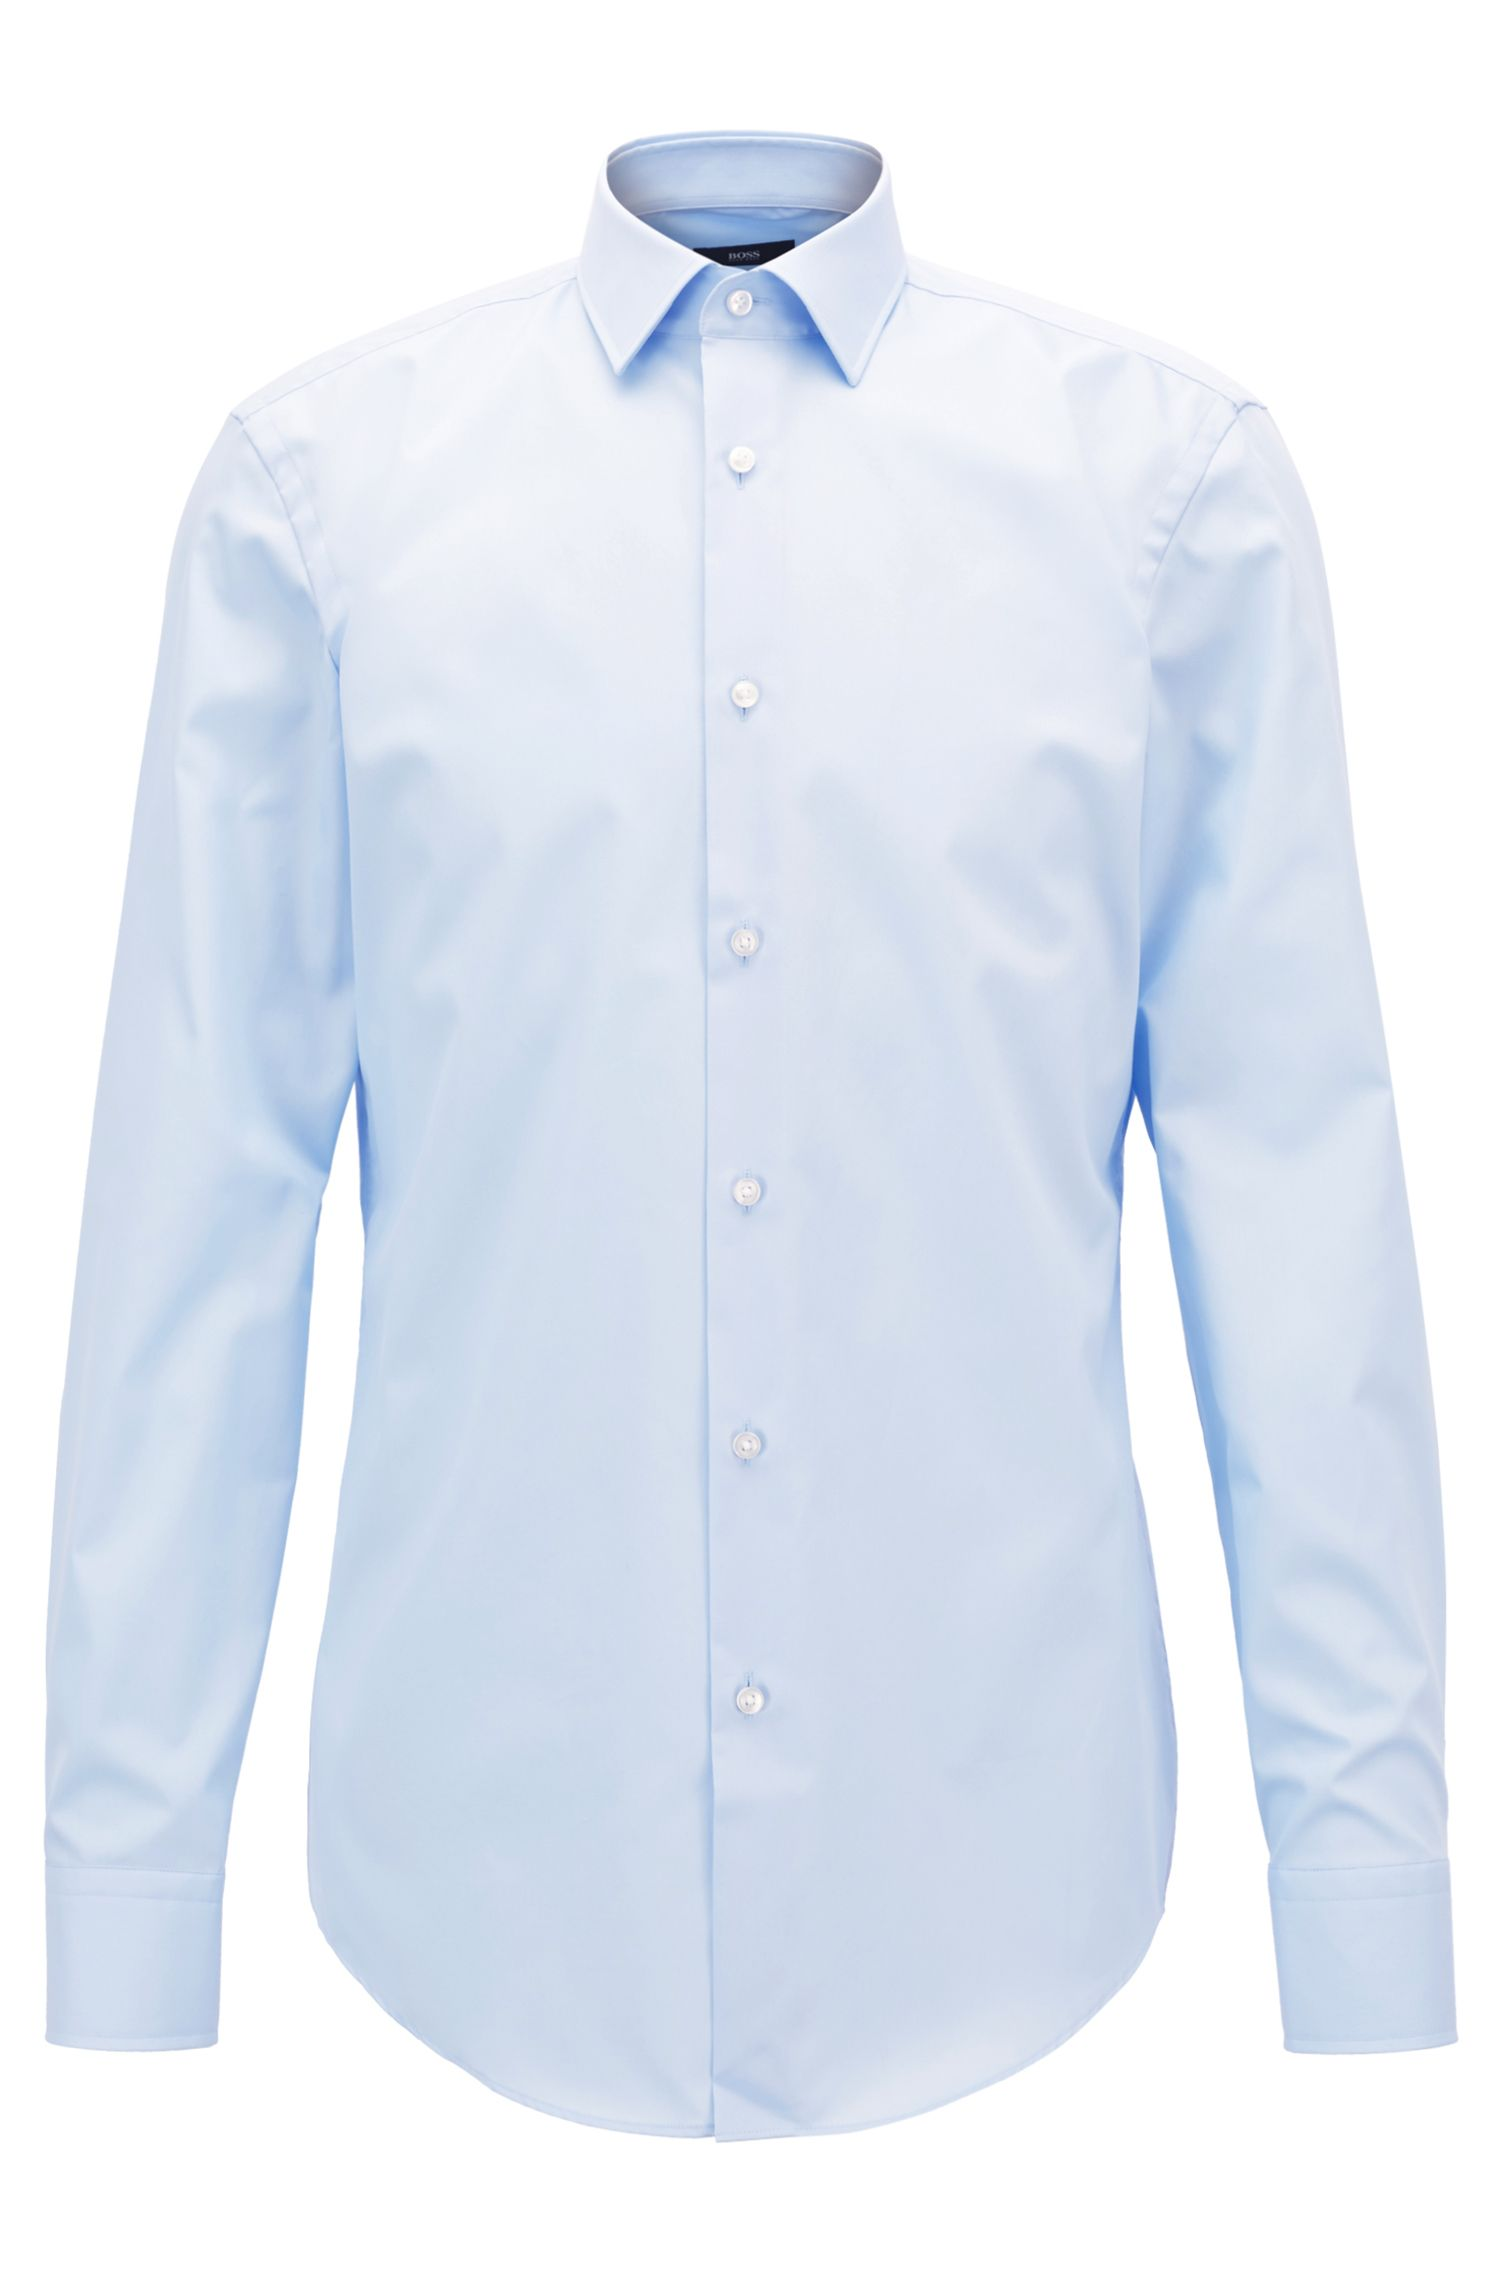 Easy-Iron Italian Cotton Dress Shirt, Slim Fit | Jenno